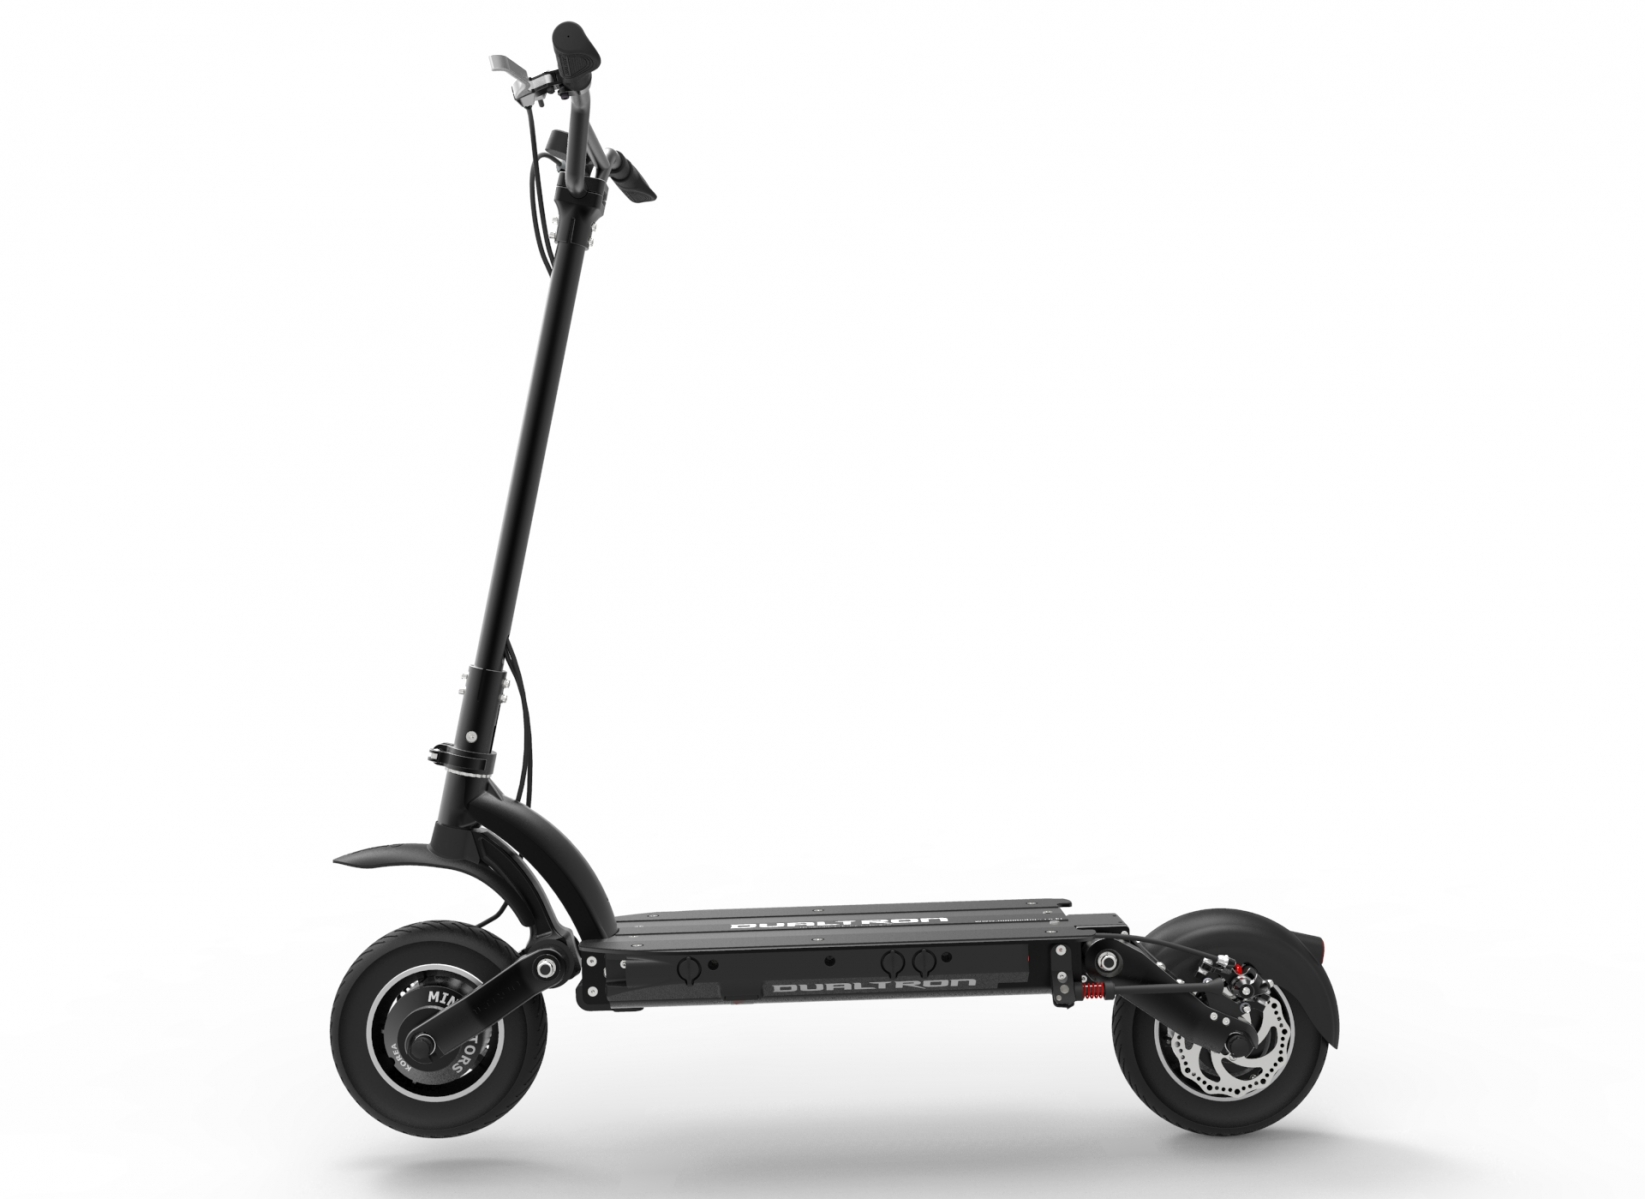 DUALTRON Trotinete Elétrica MX (Velocidade máxima: 65 km/h | Autonomia: 50 a 70 km)